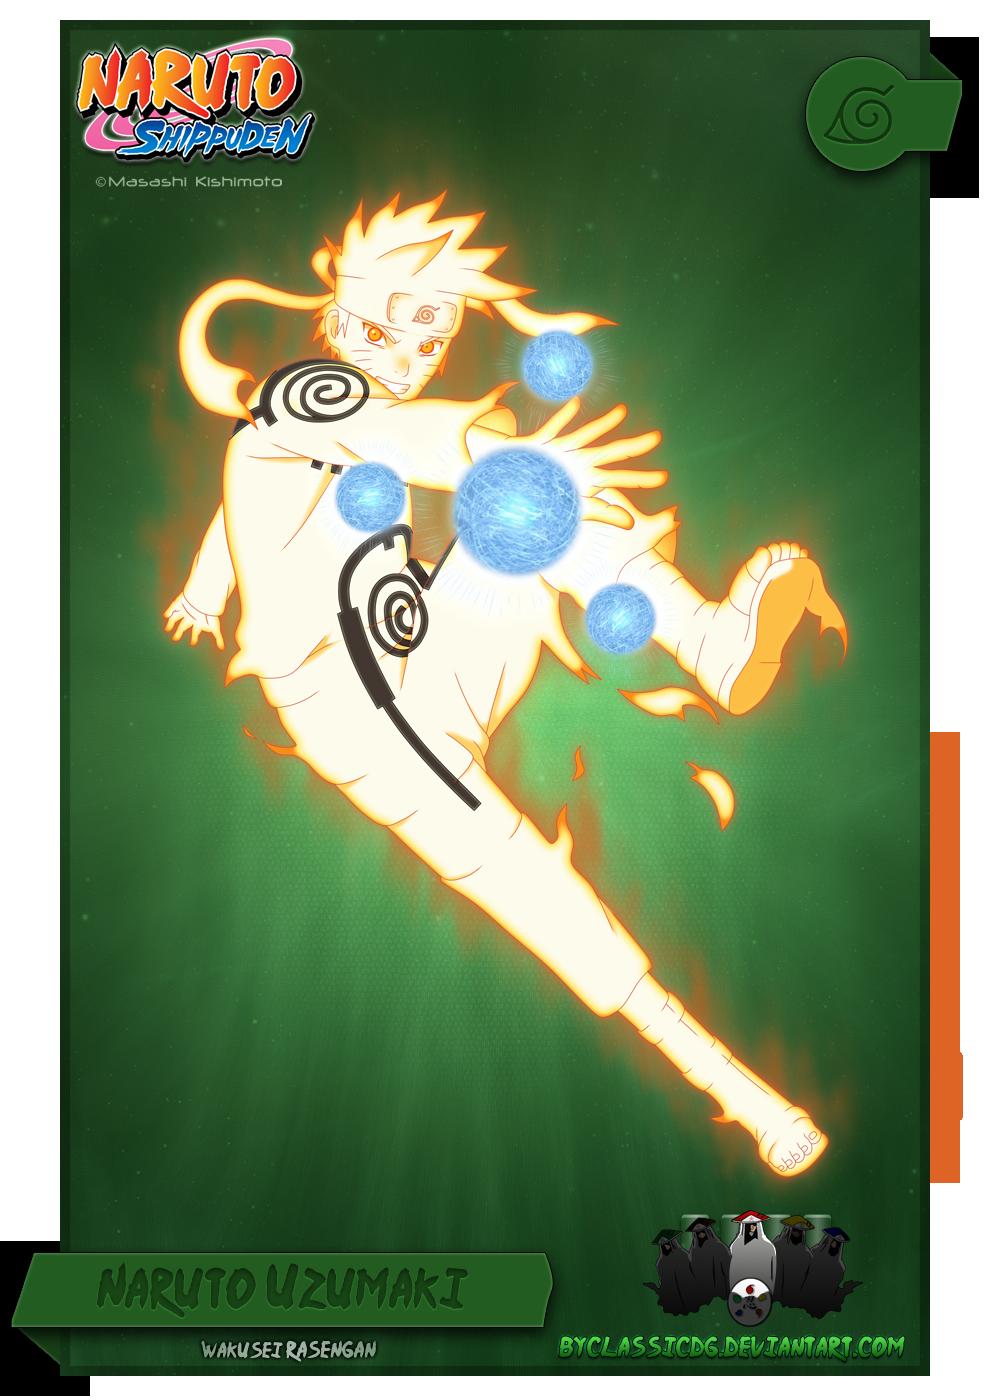 Naruto Uzumaki by byClassicDG